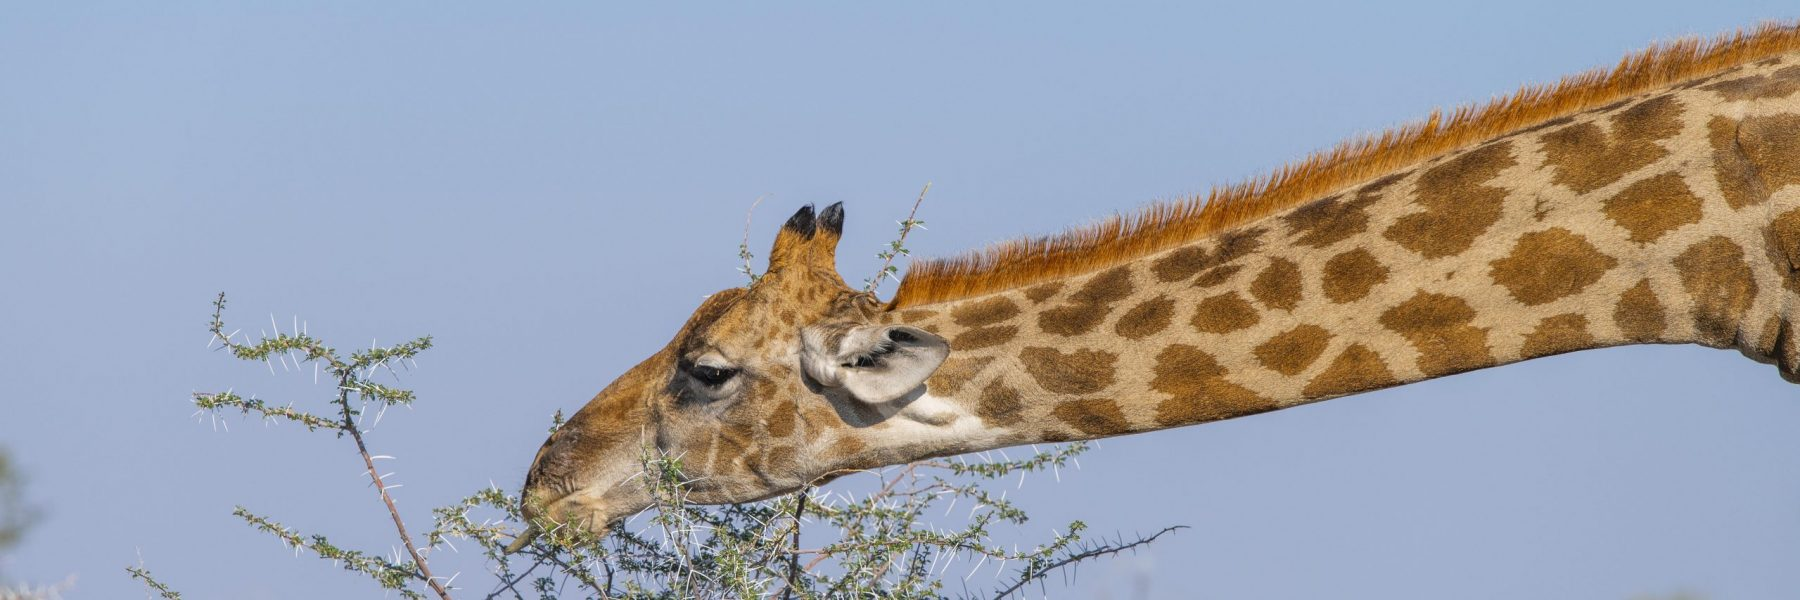 Giraffe (Giraffa) frisst an einem Dornbusch, Etosha National Park, Namibia